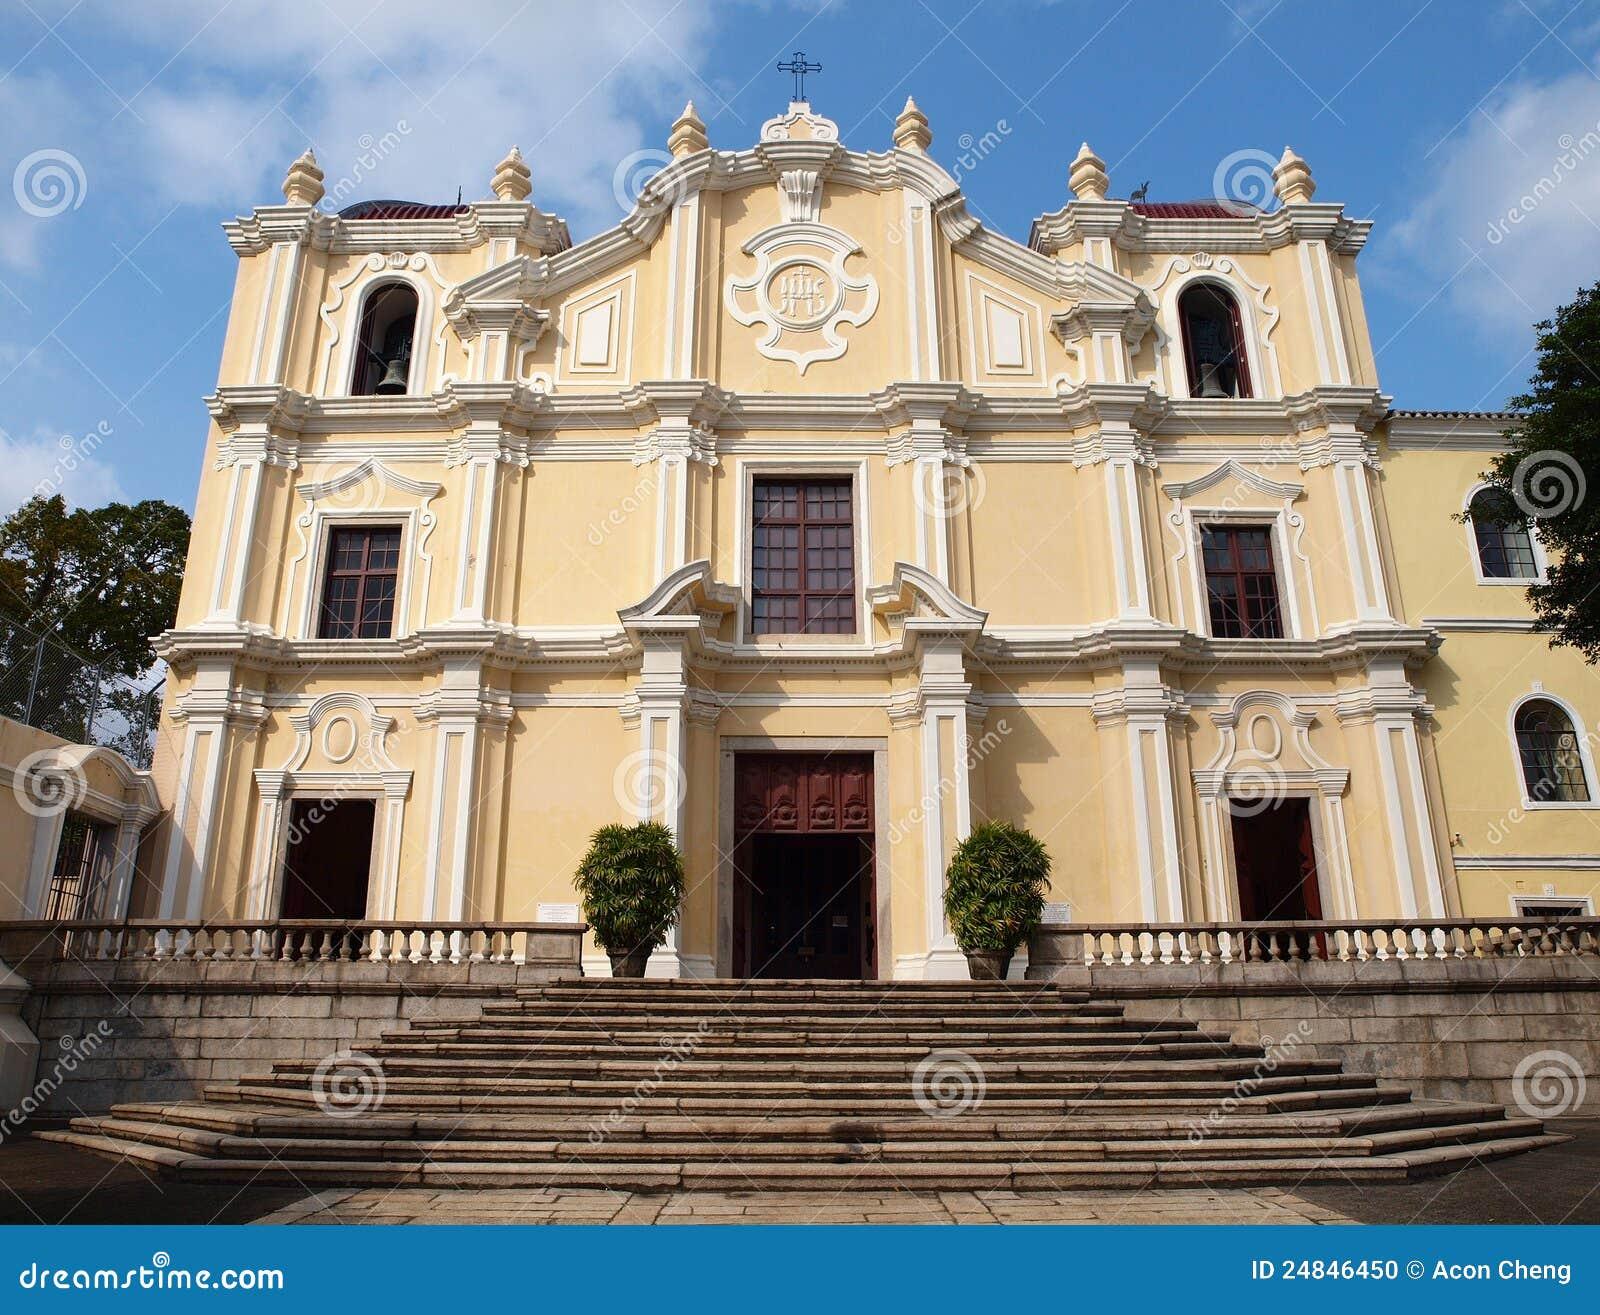 Theology saint joseph s day and quezon